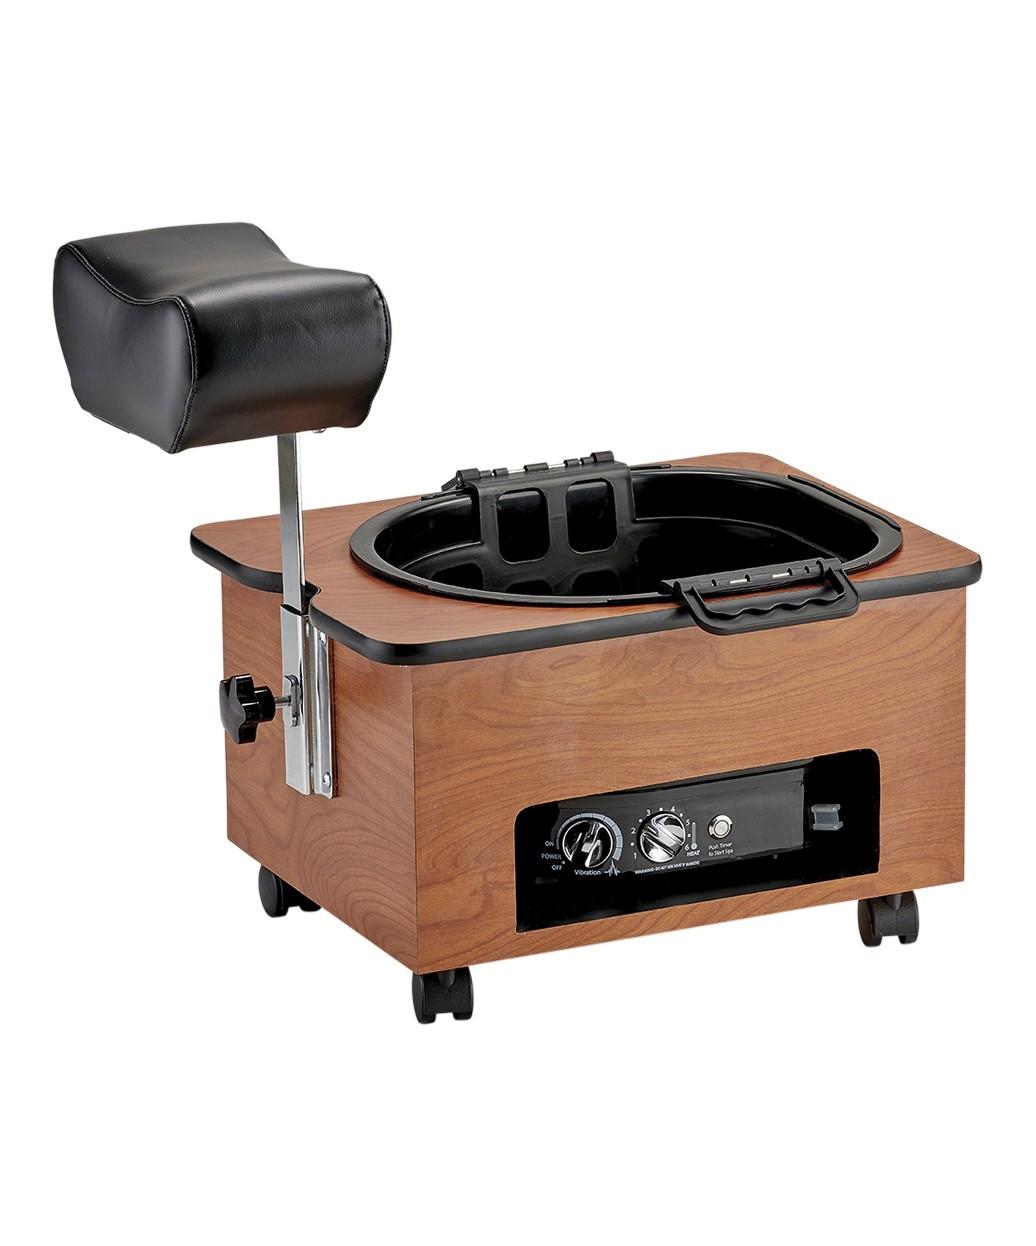 Awesome Portable Pedicure Tub Photograph Of Bathtub Style